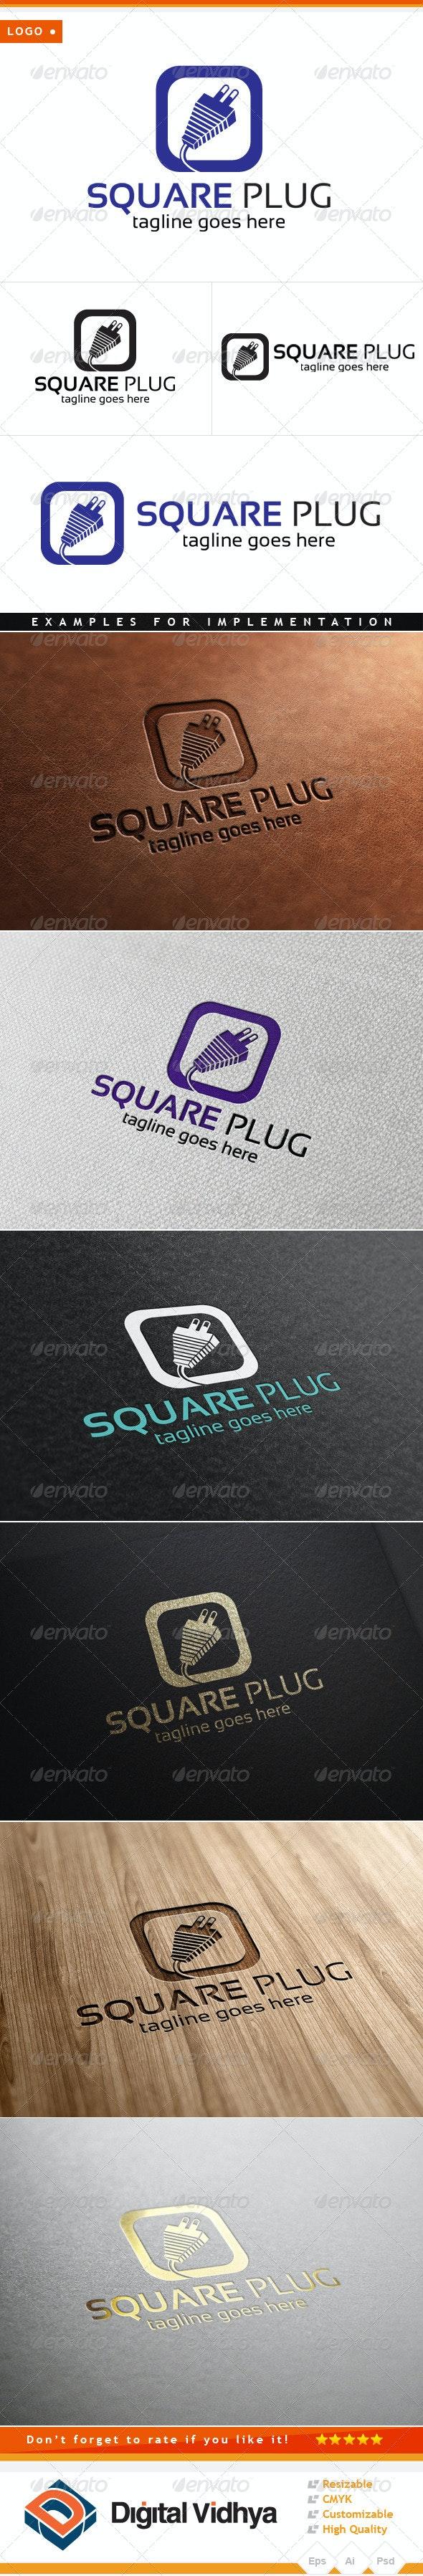 Square & Plug Logo - Symbols Logo Templates